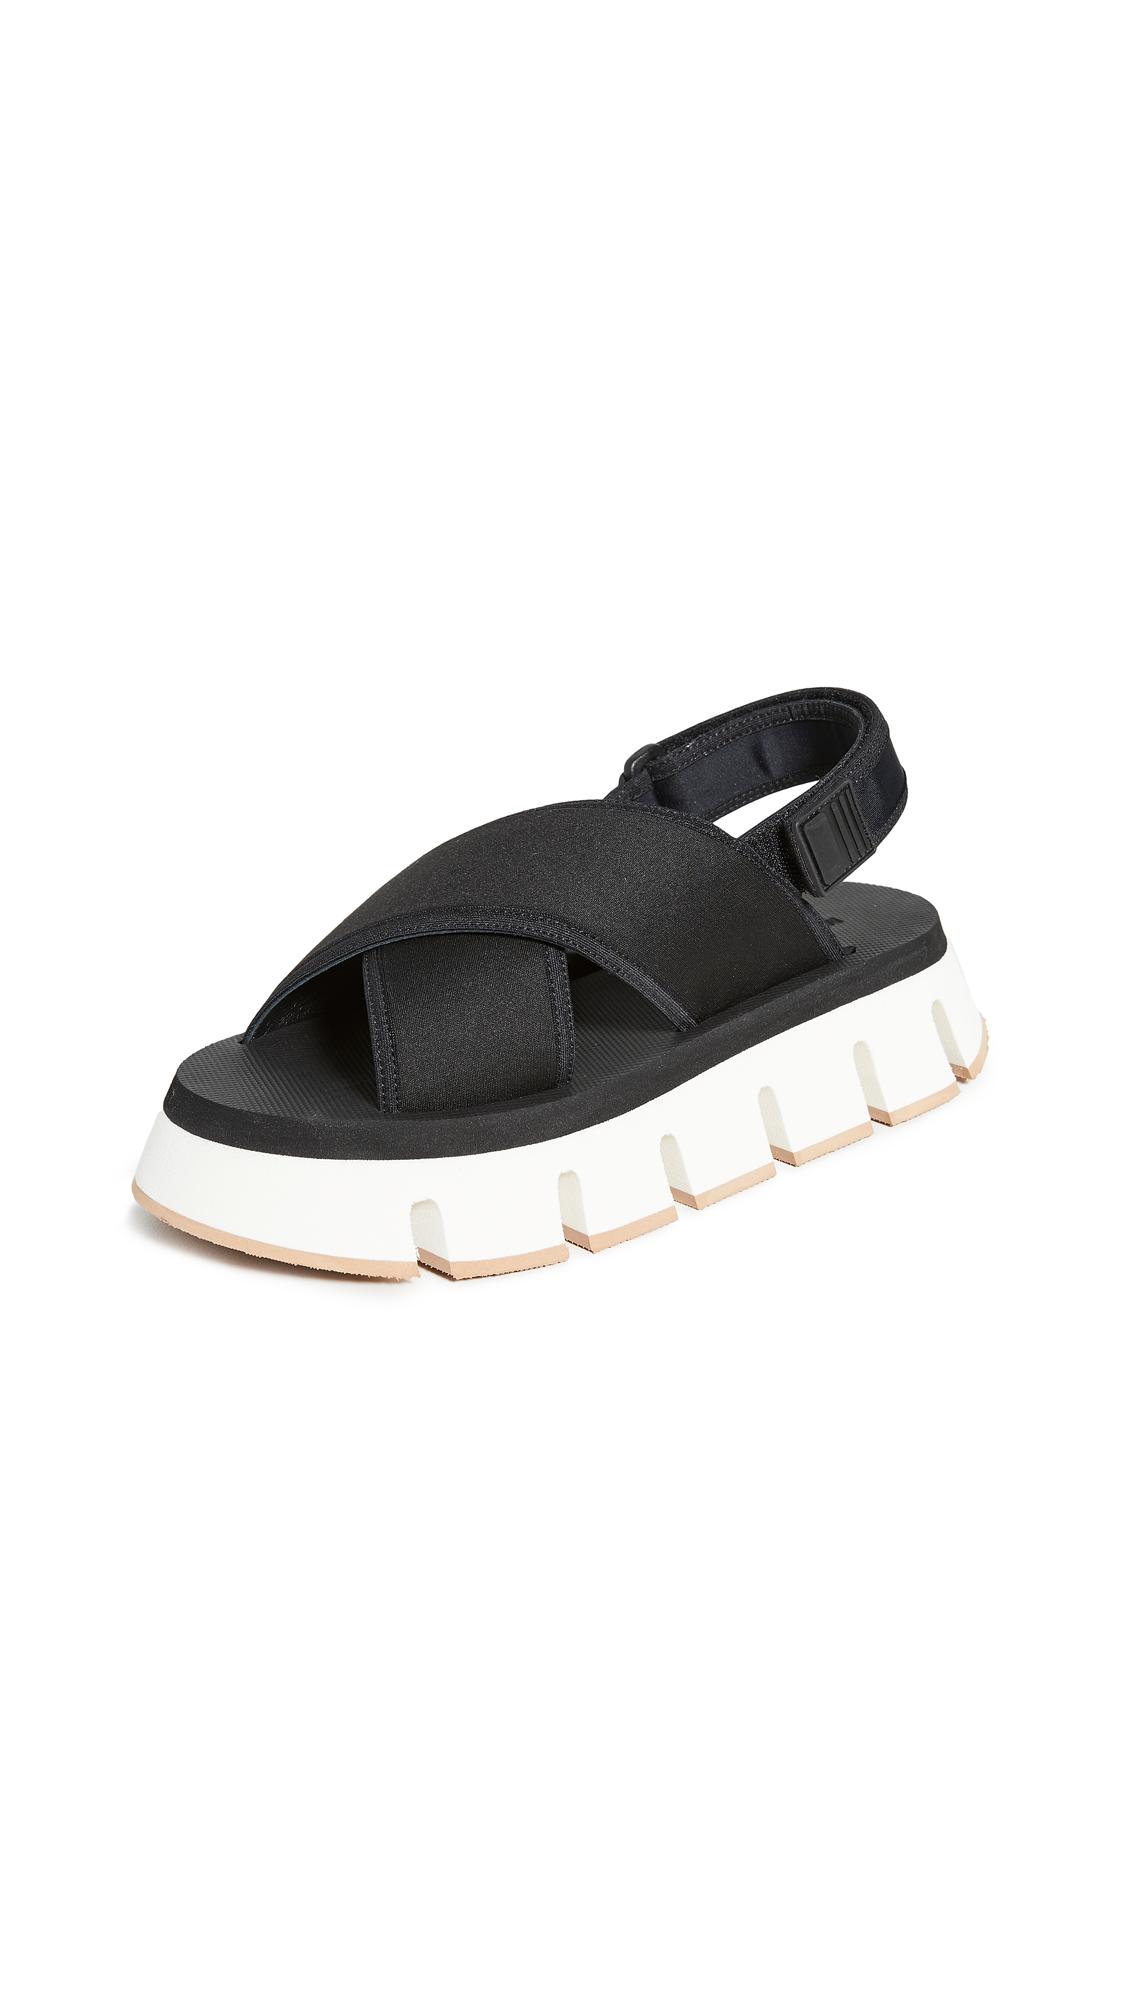 Buy Marni Platform Track Sole Crisscross Sandals online, shop Marni